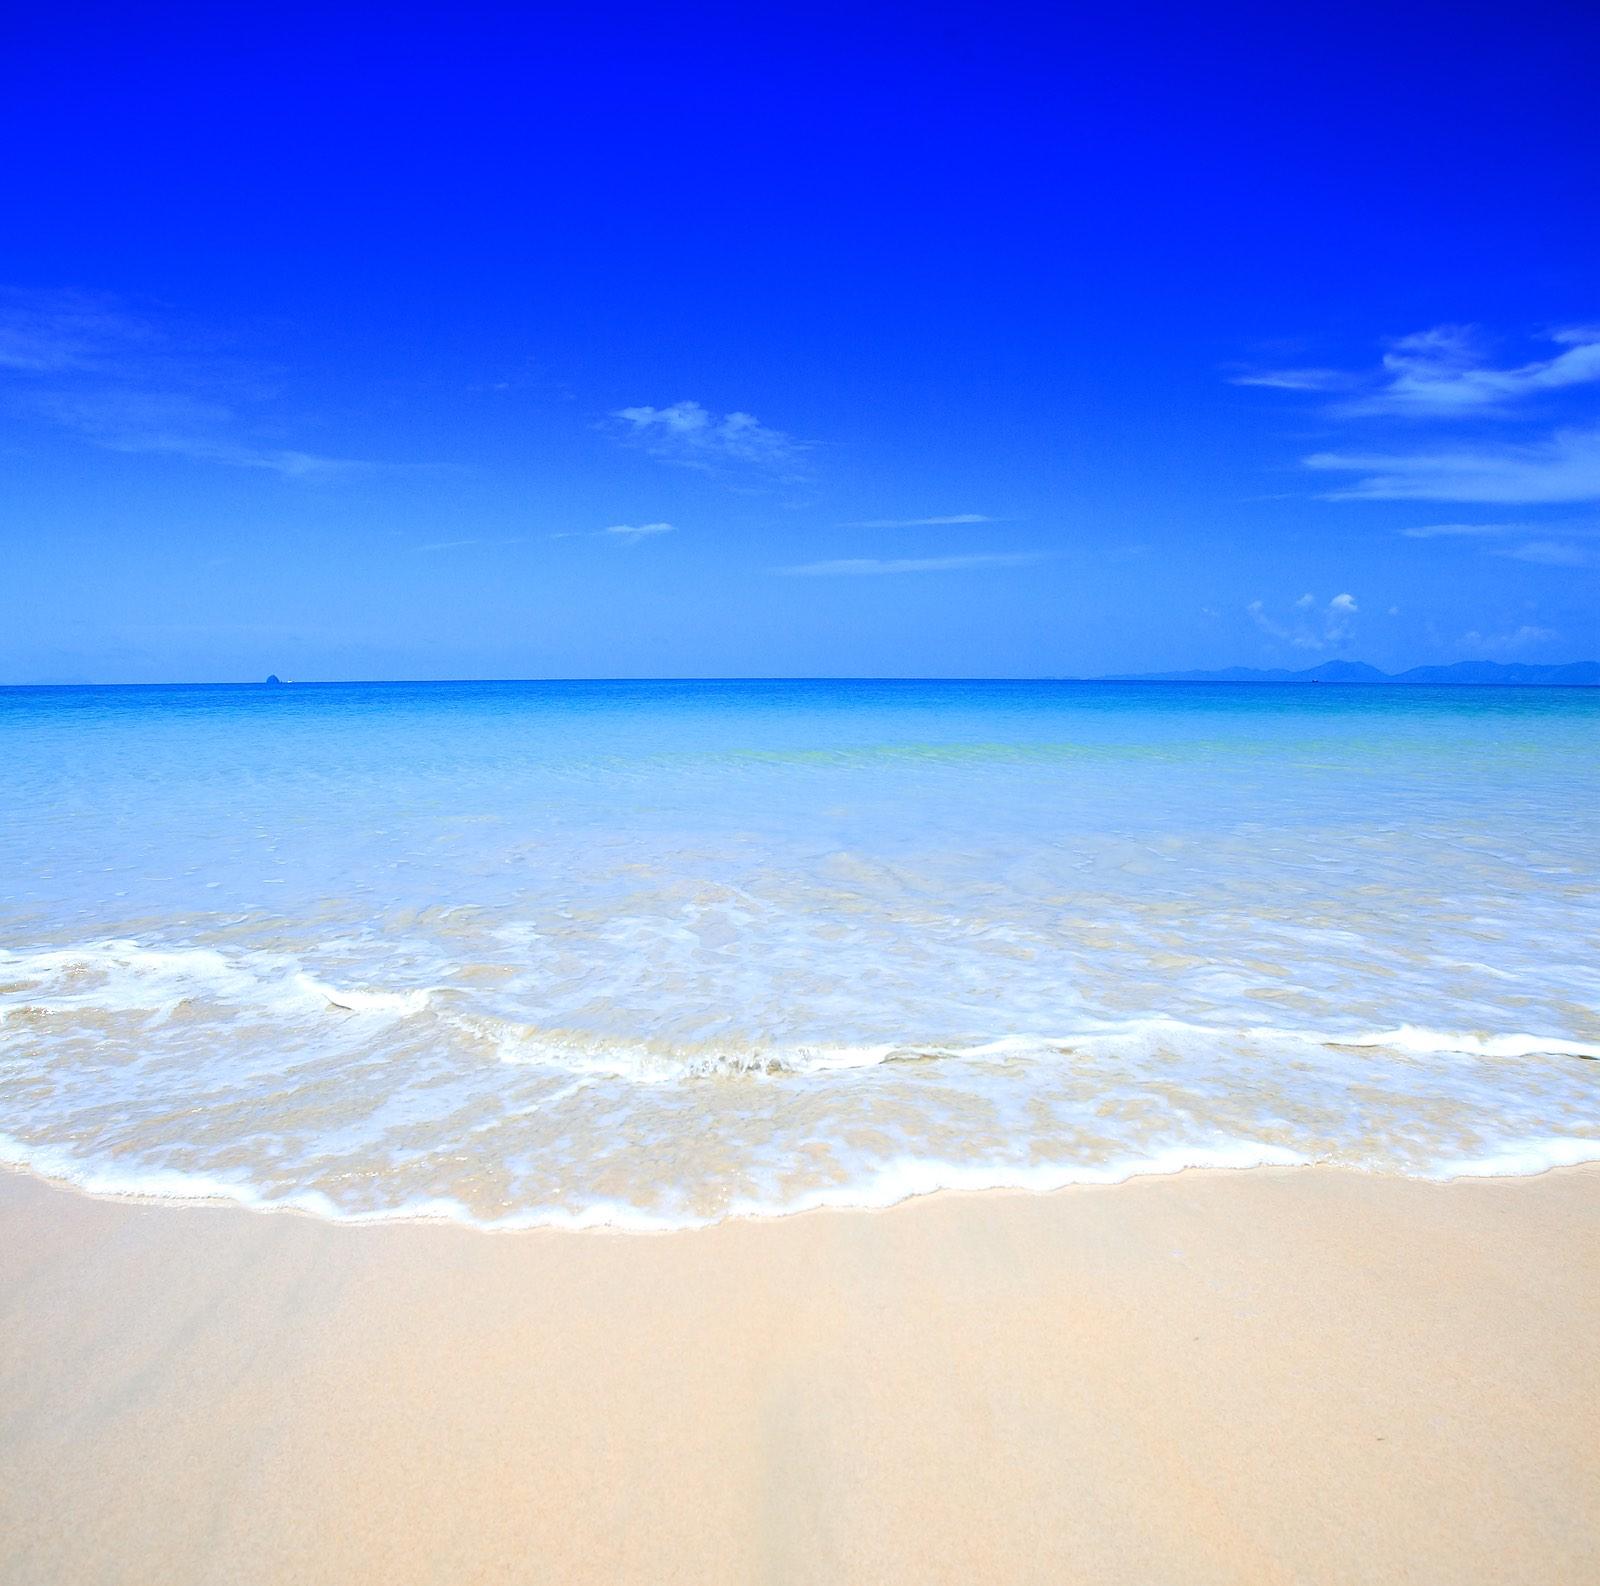 bigstock-Beautiful-beach-with-crystal-c-18061586